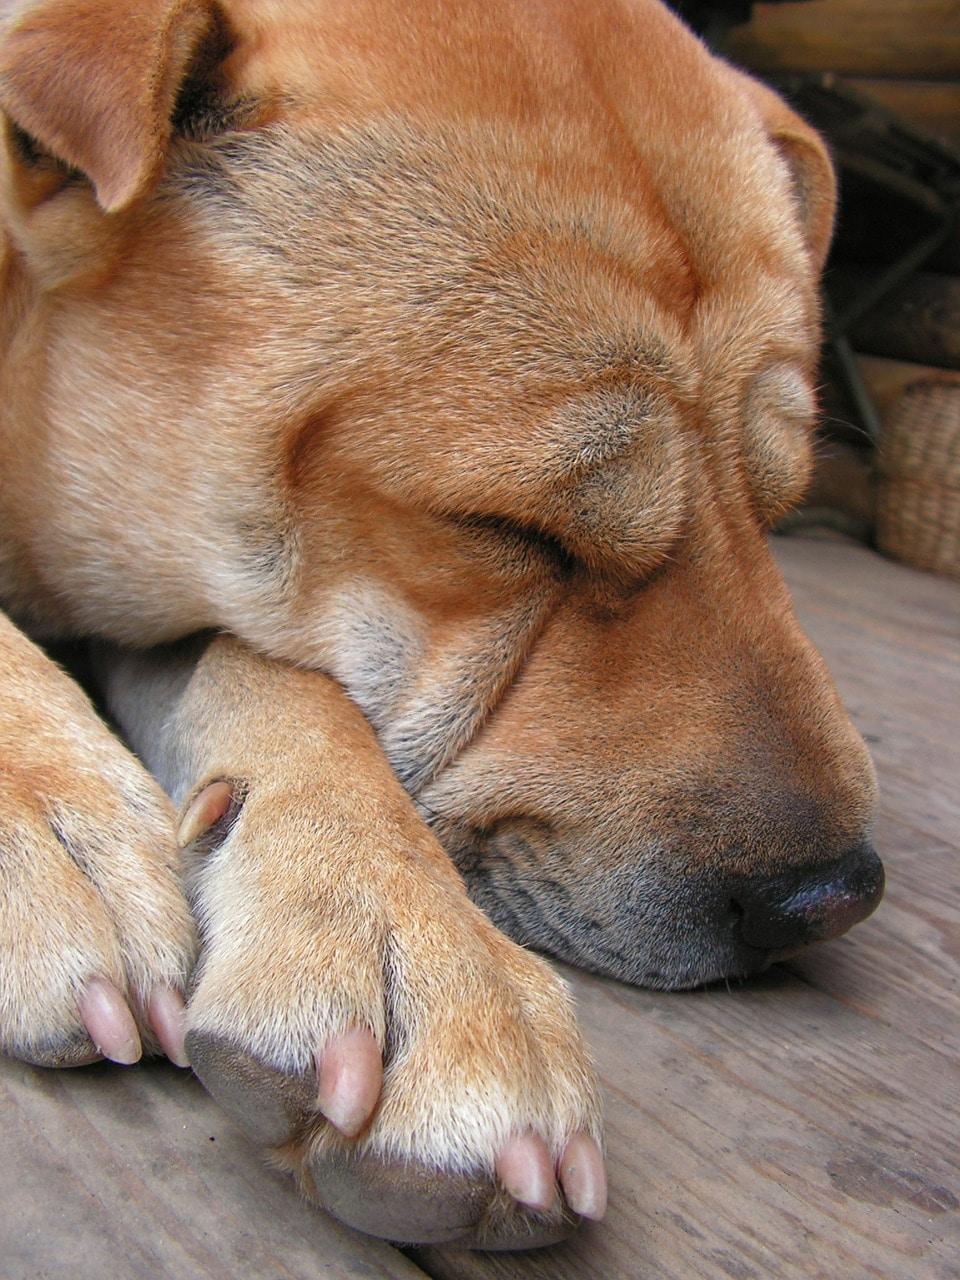 dog, dormant, sleep